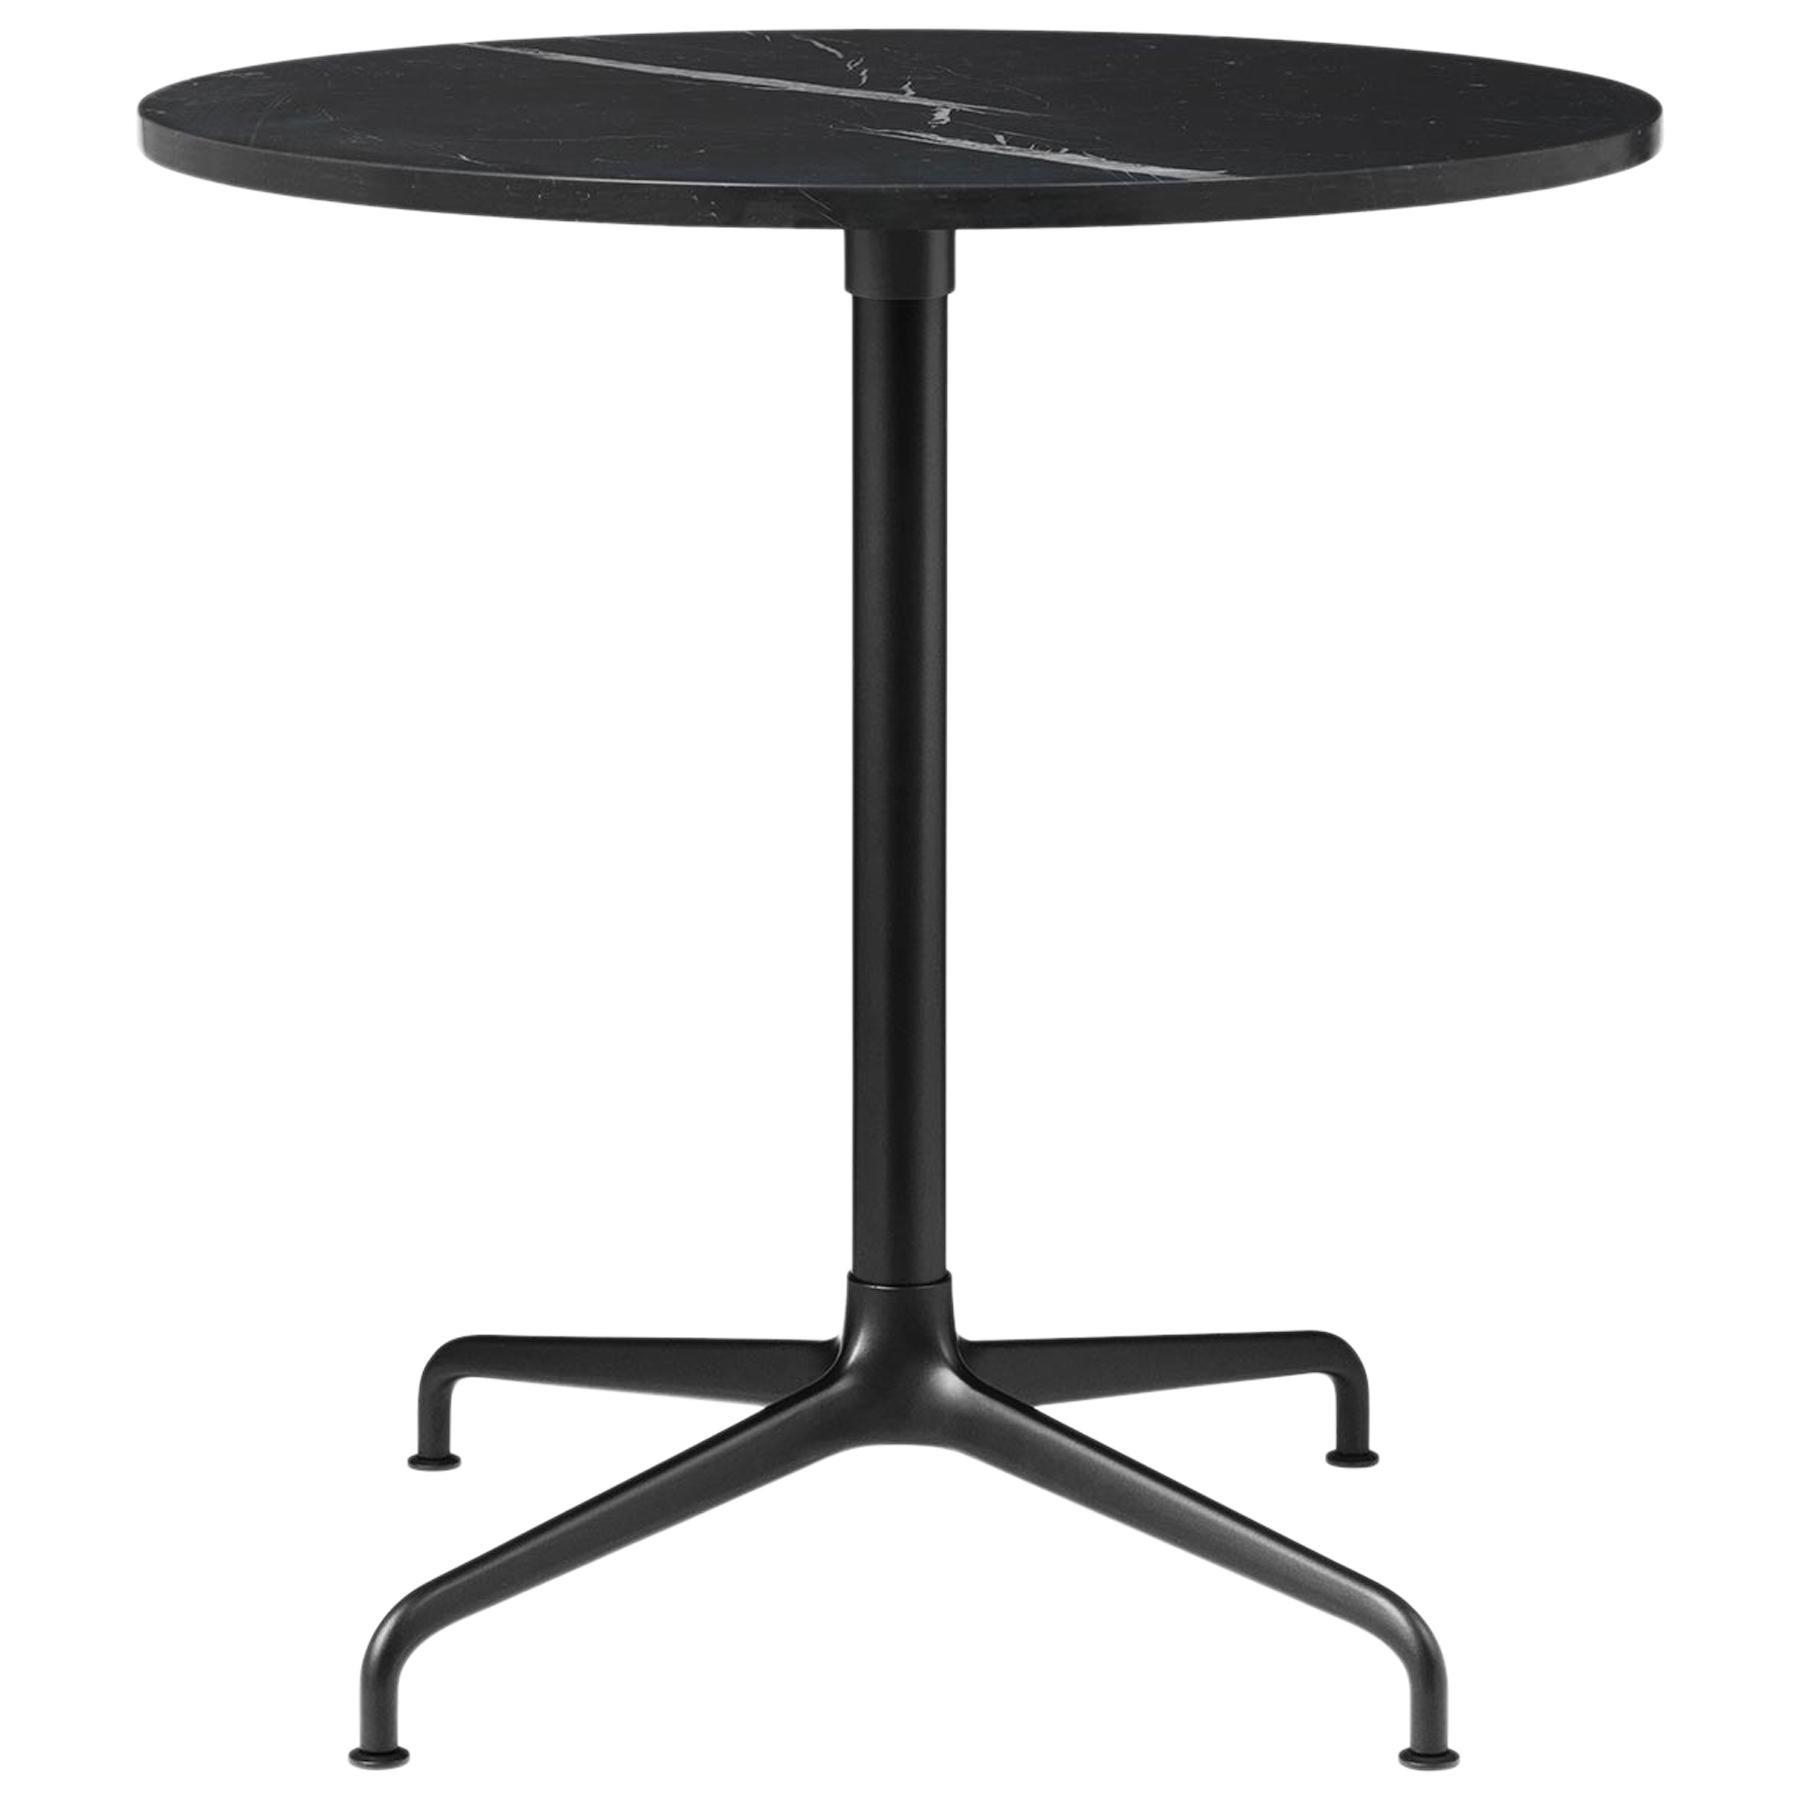 Beetle Dining Chair, Round, 4 Star Base, Large, Laminate